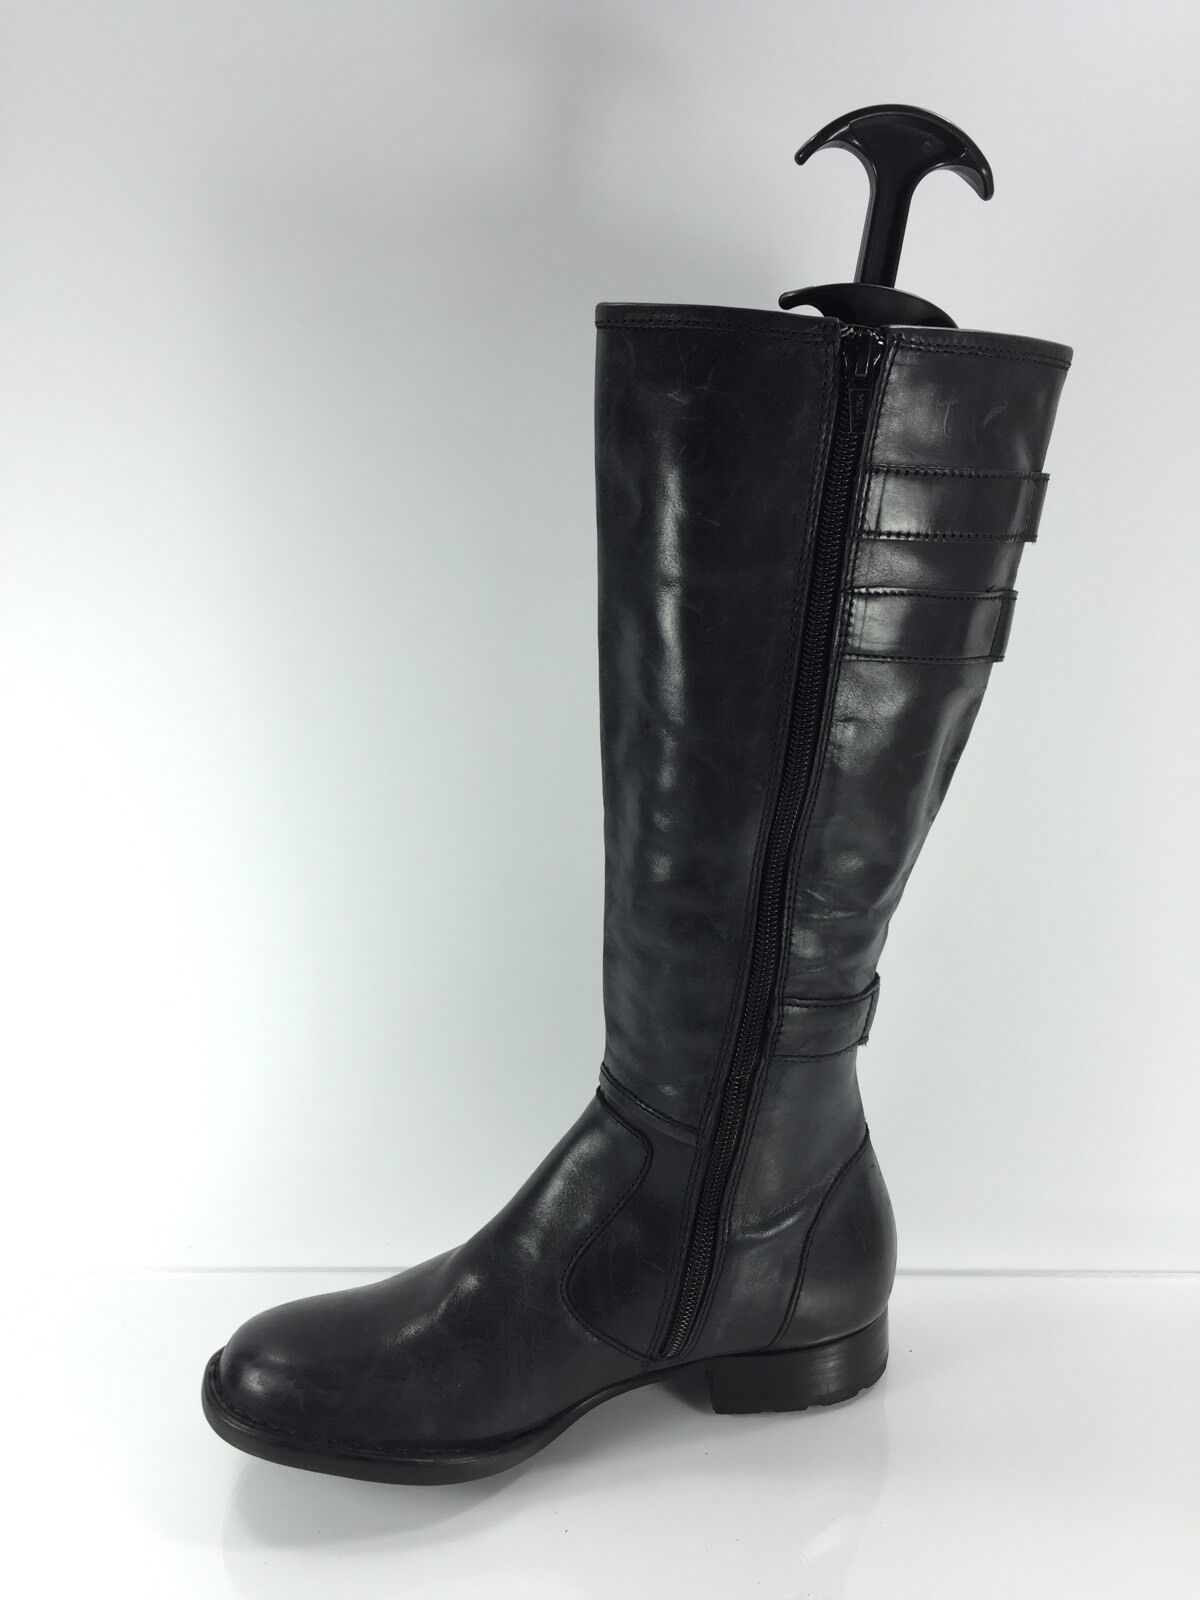 Børn Womens Black Leather Knee Boots 5.5